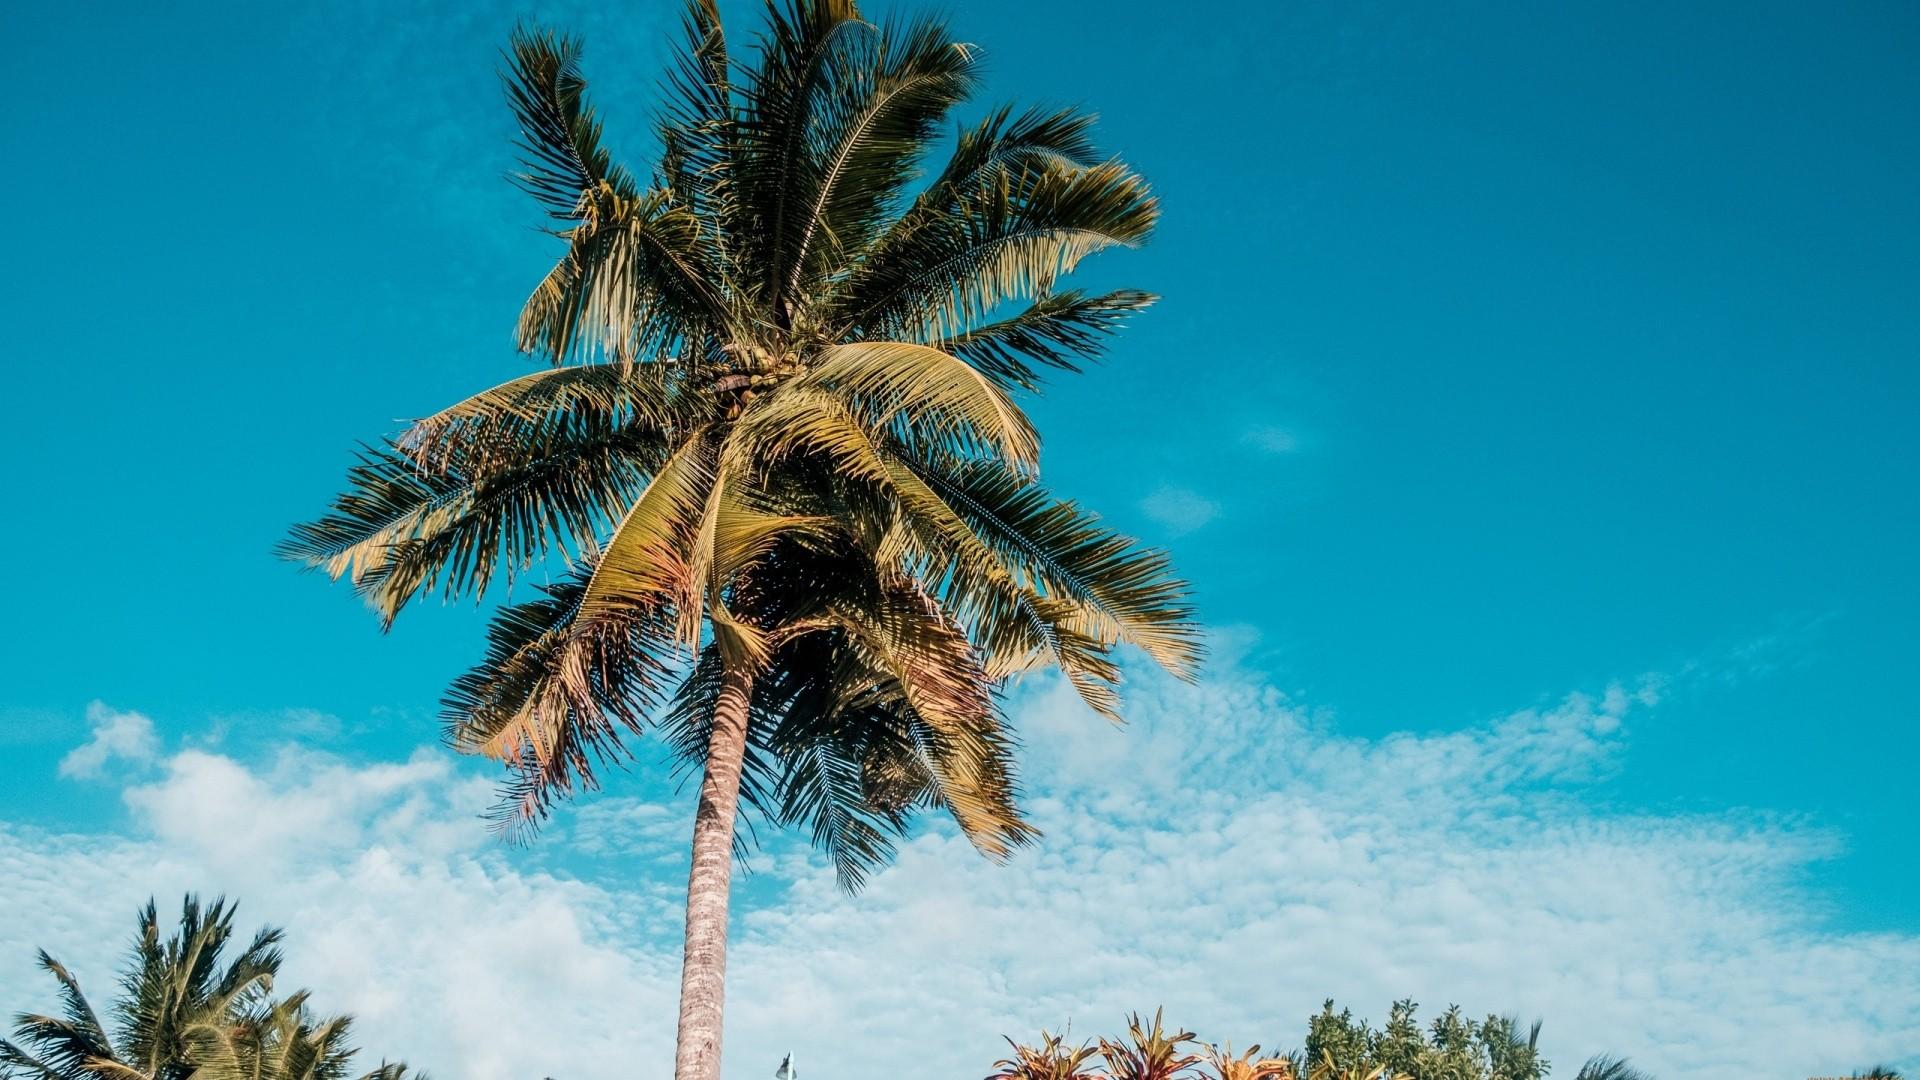 Palm Tree High Quality